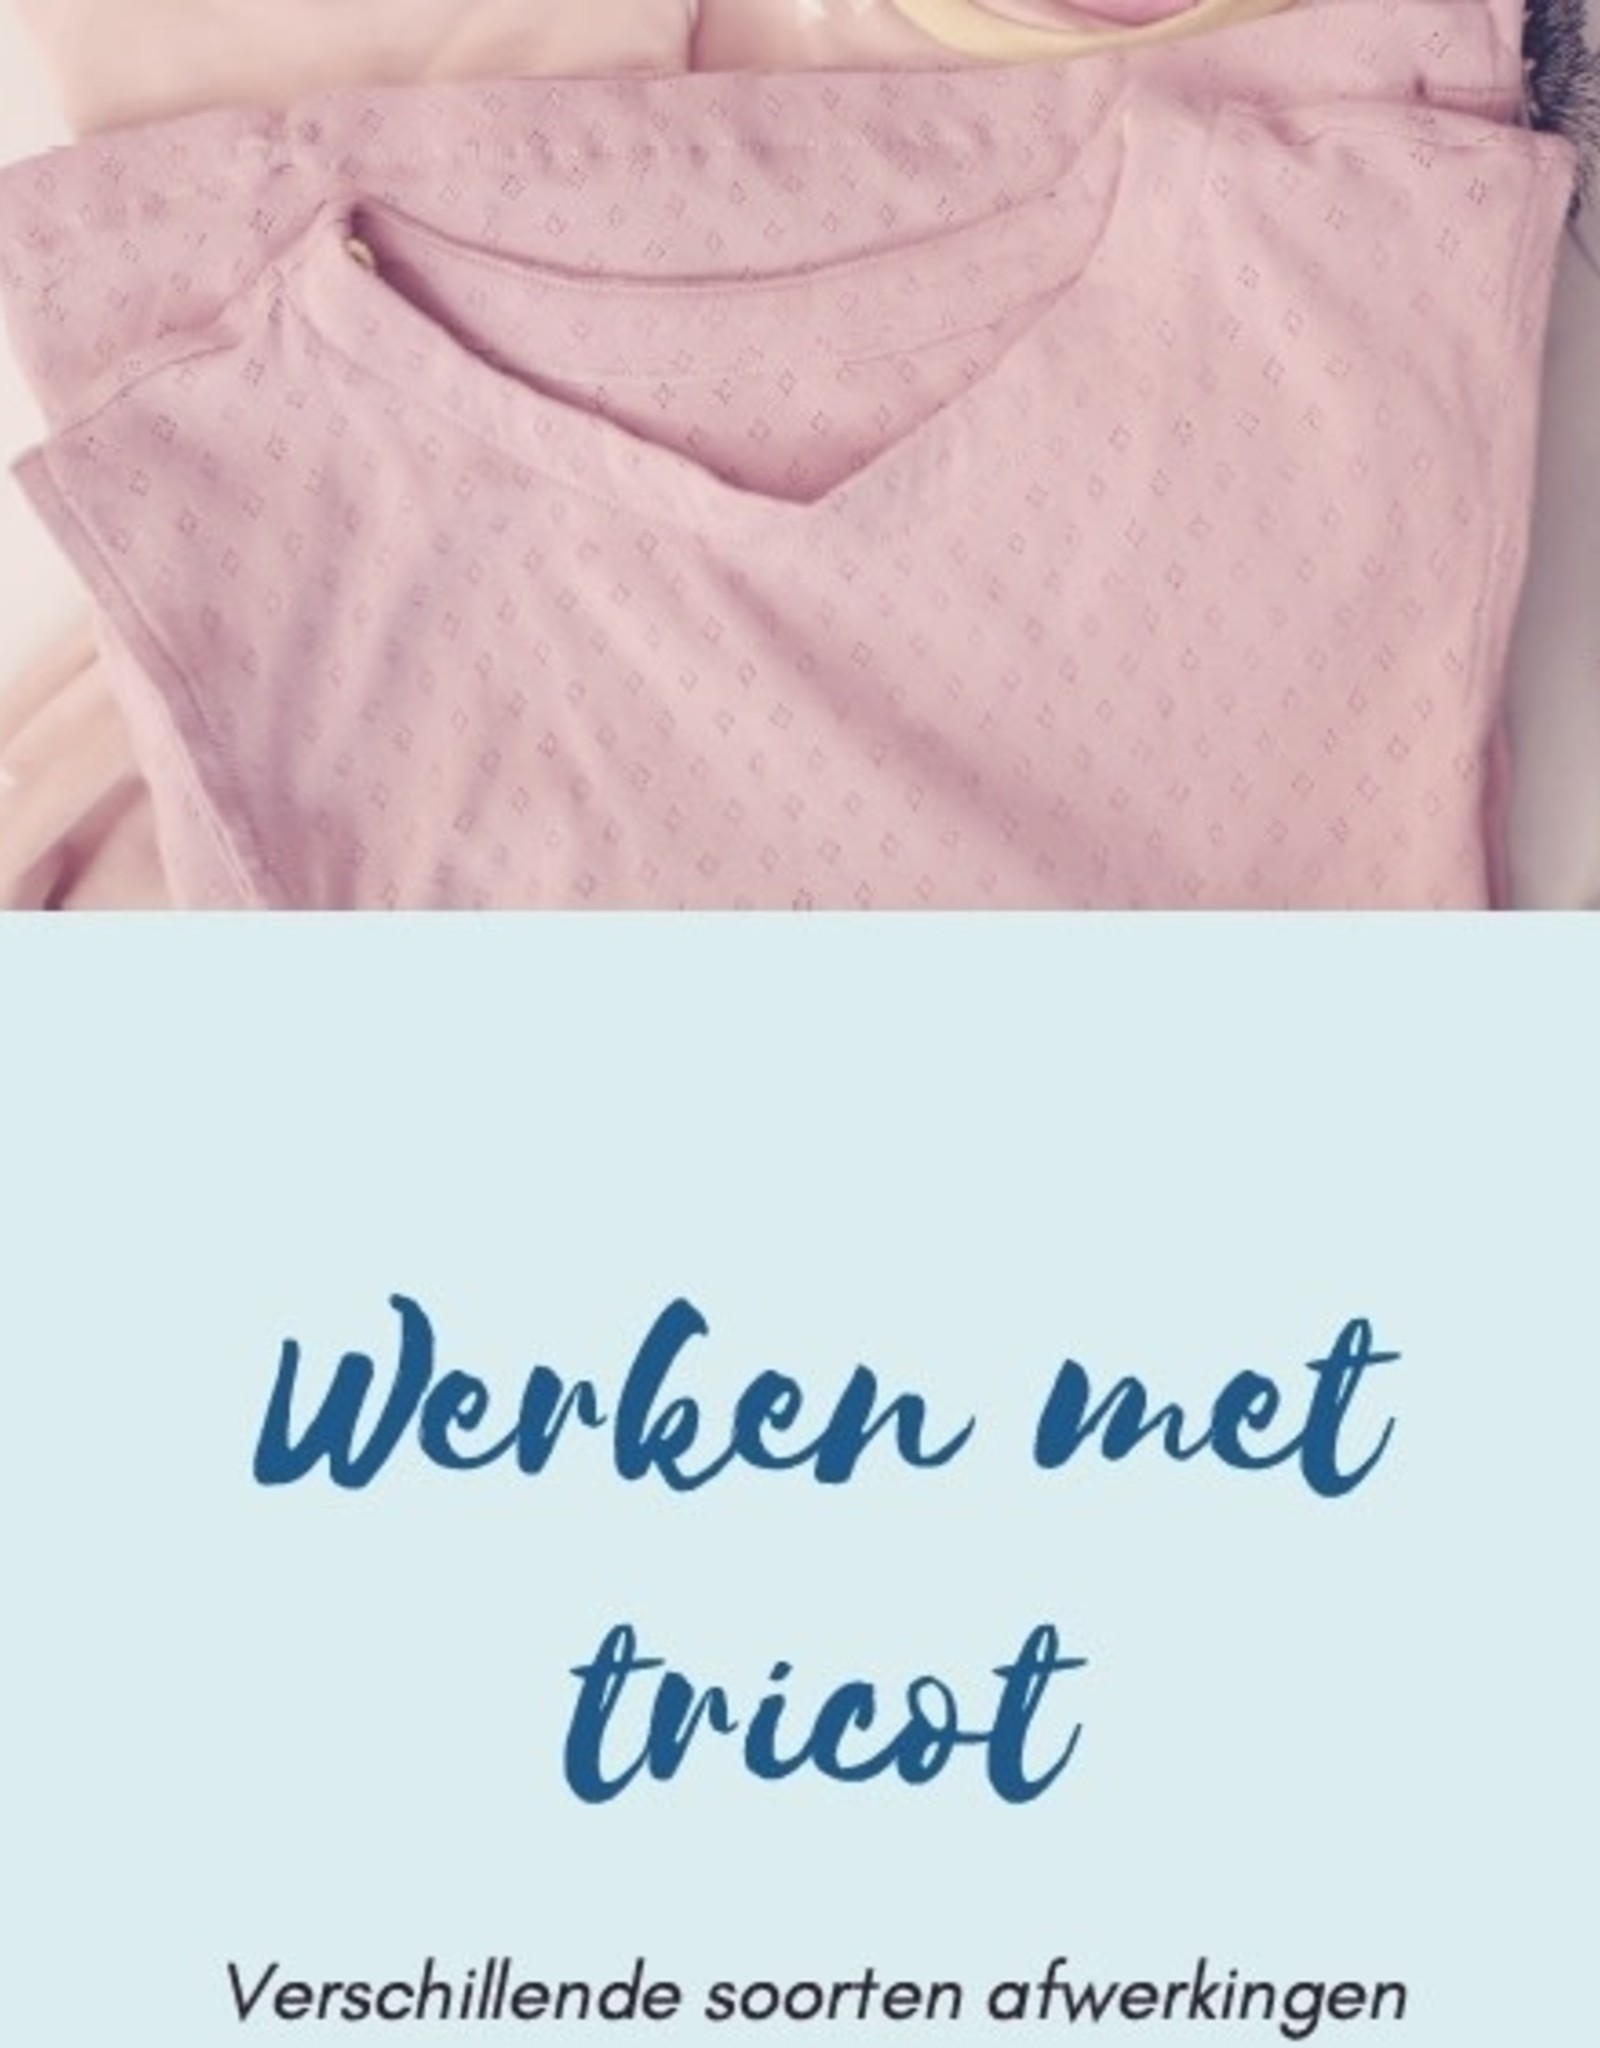 Workshop werken met tricot 7 en 14/10